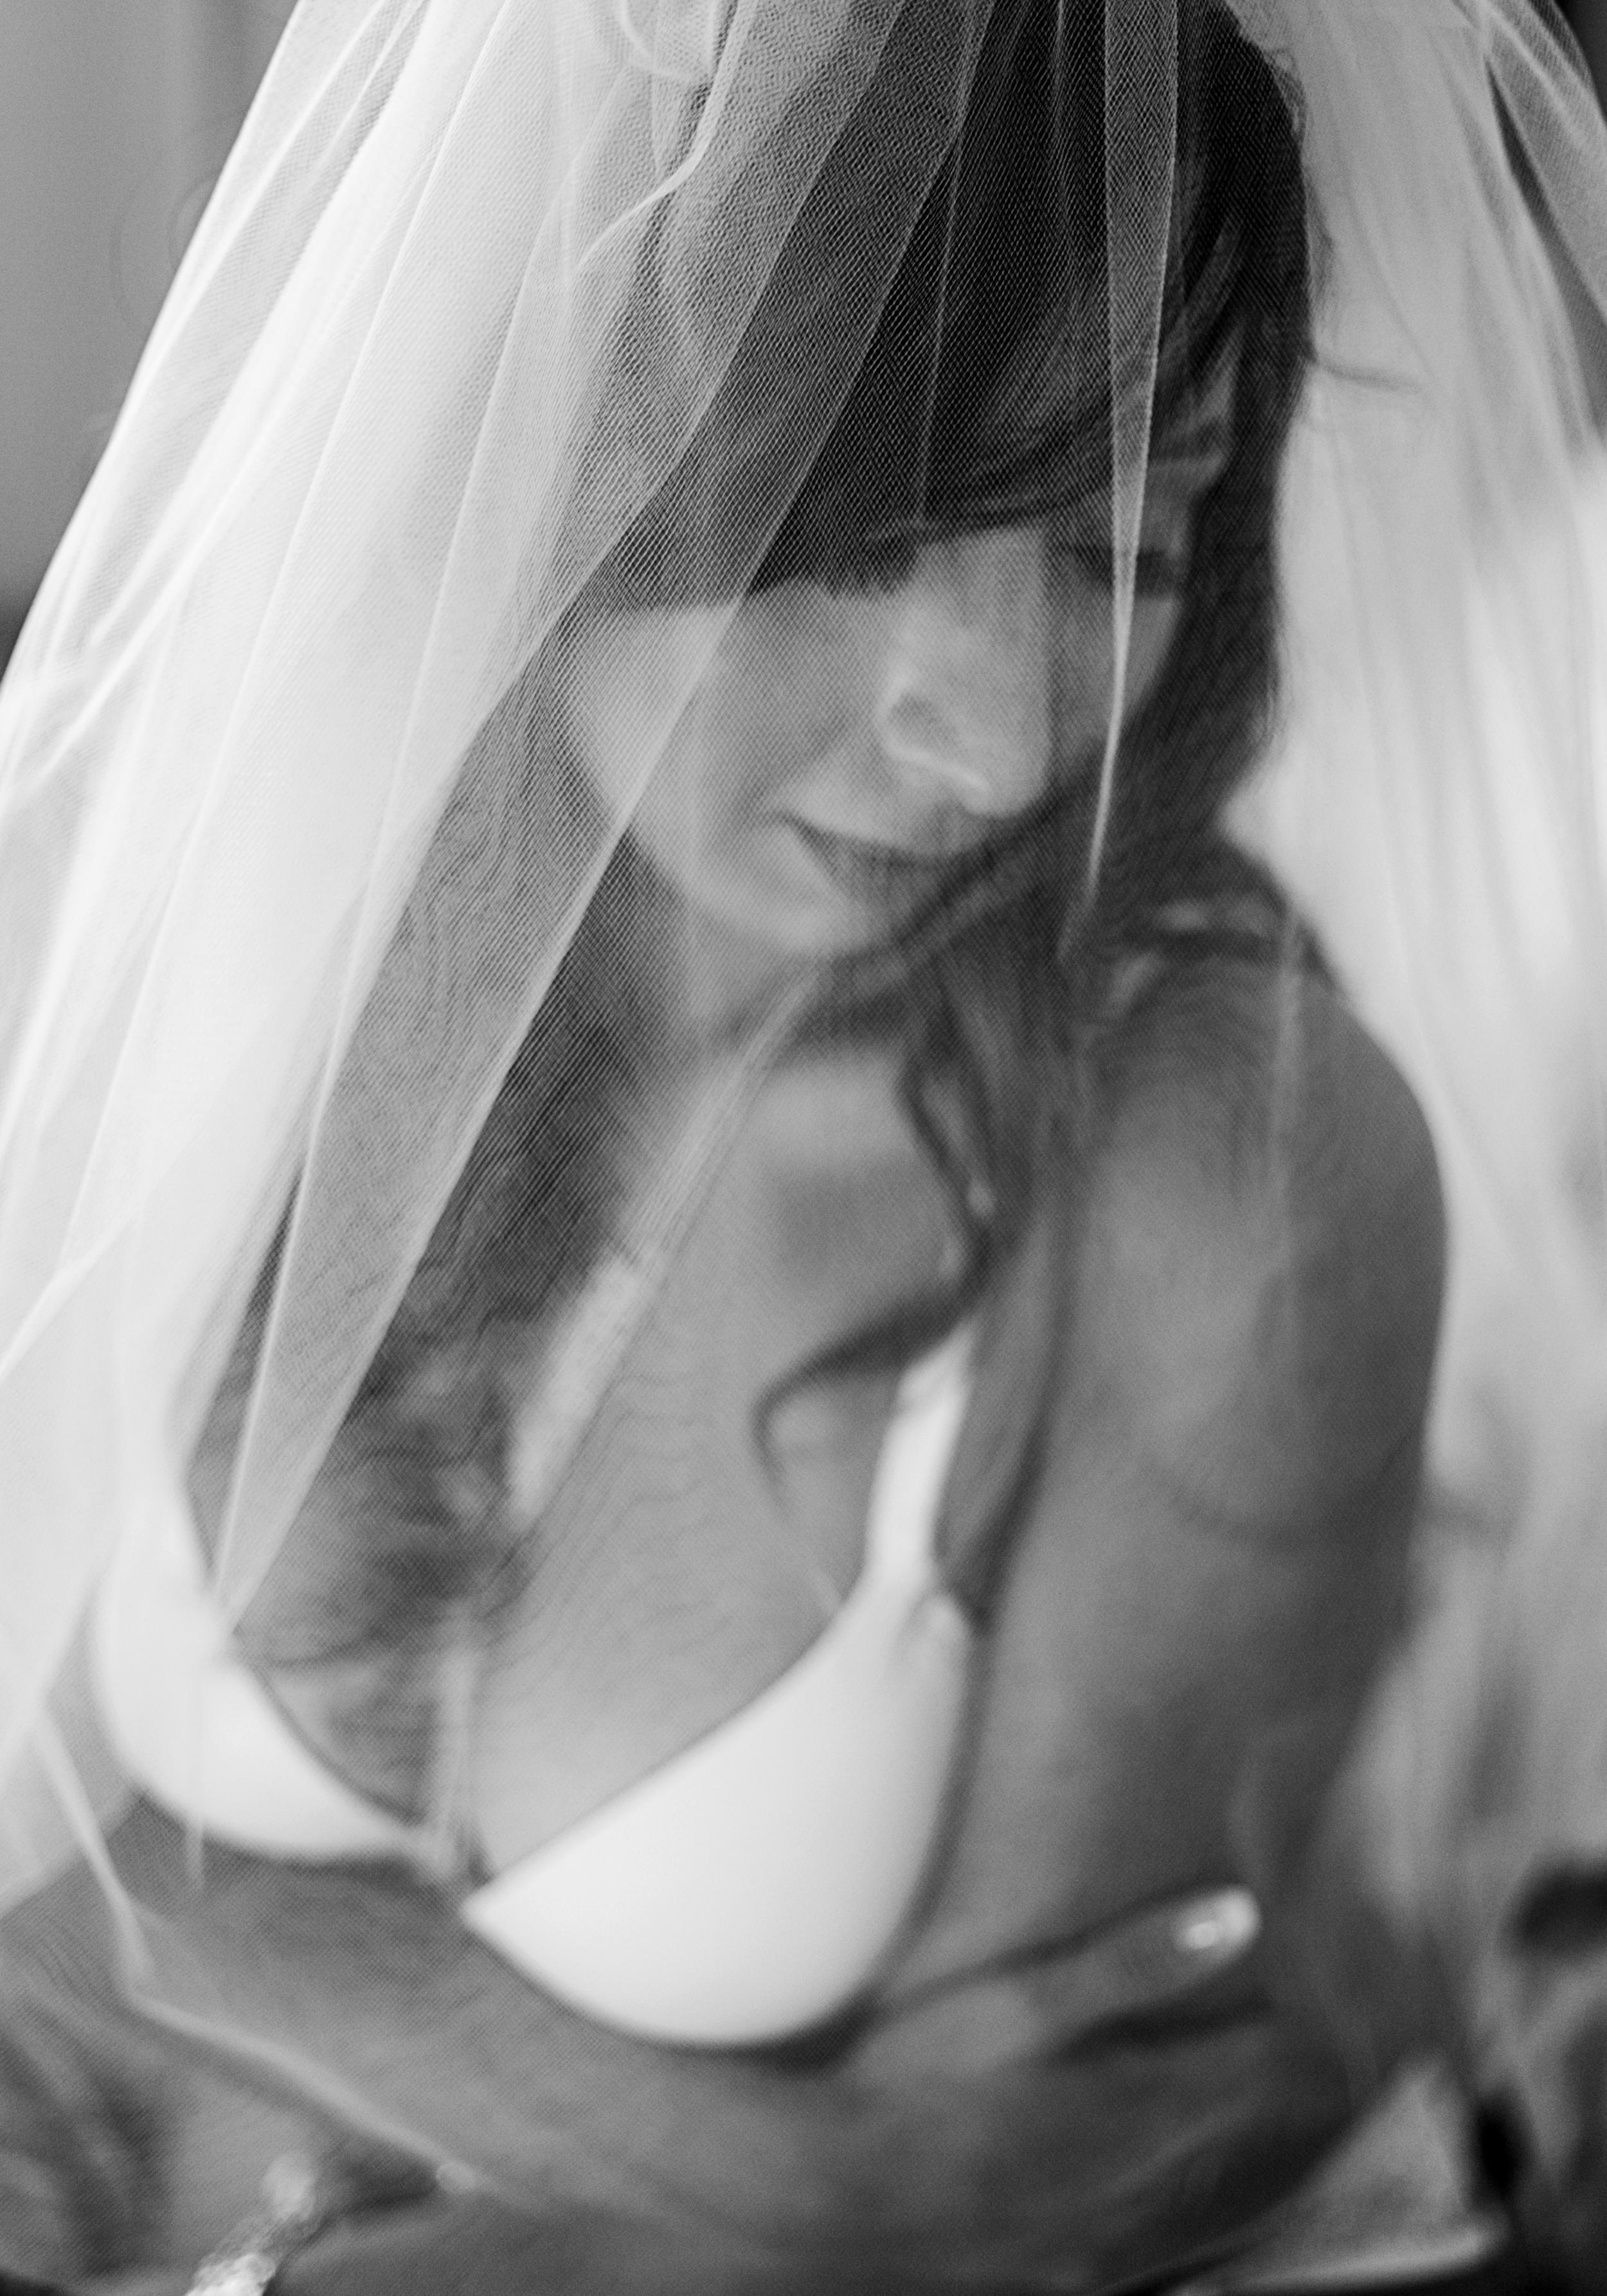 freeport-texas-boudoir-photography-photographer-studio